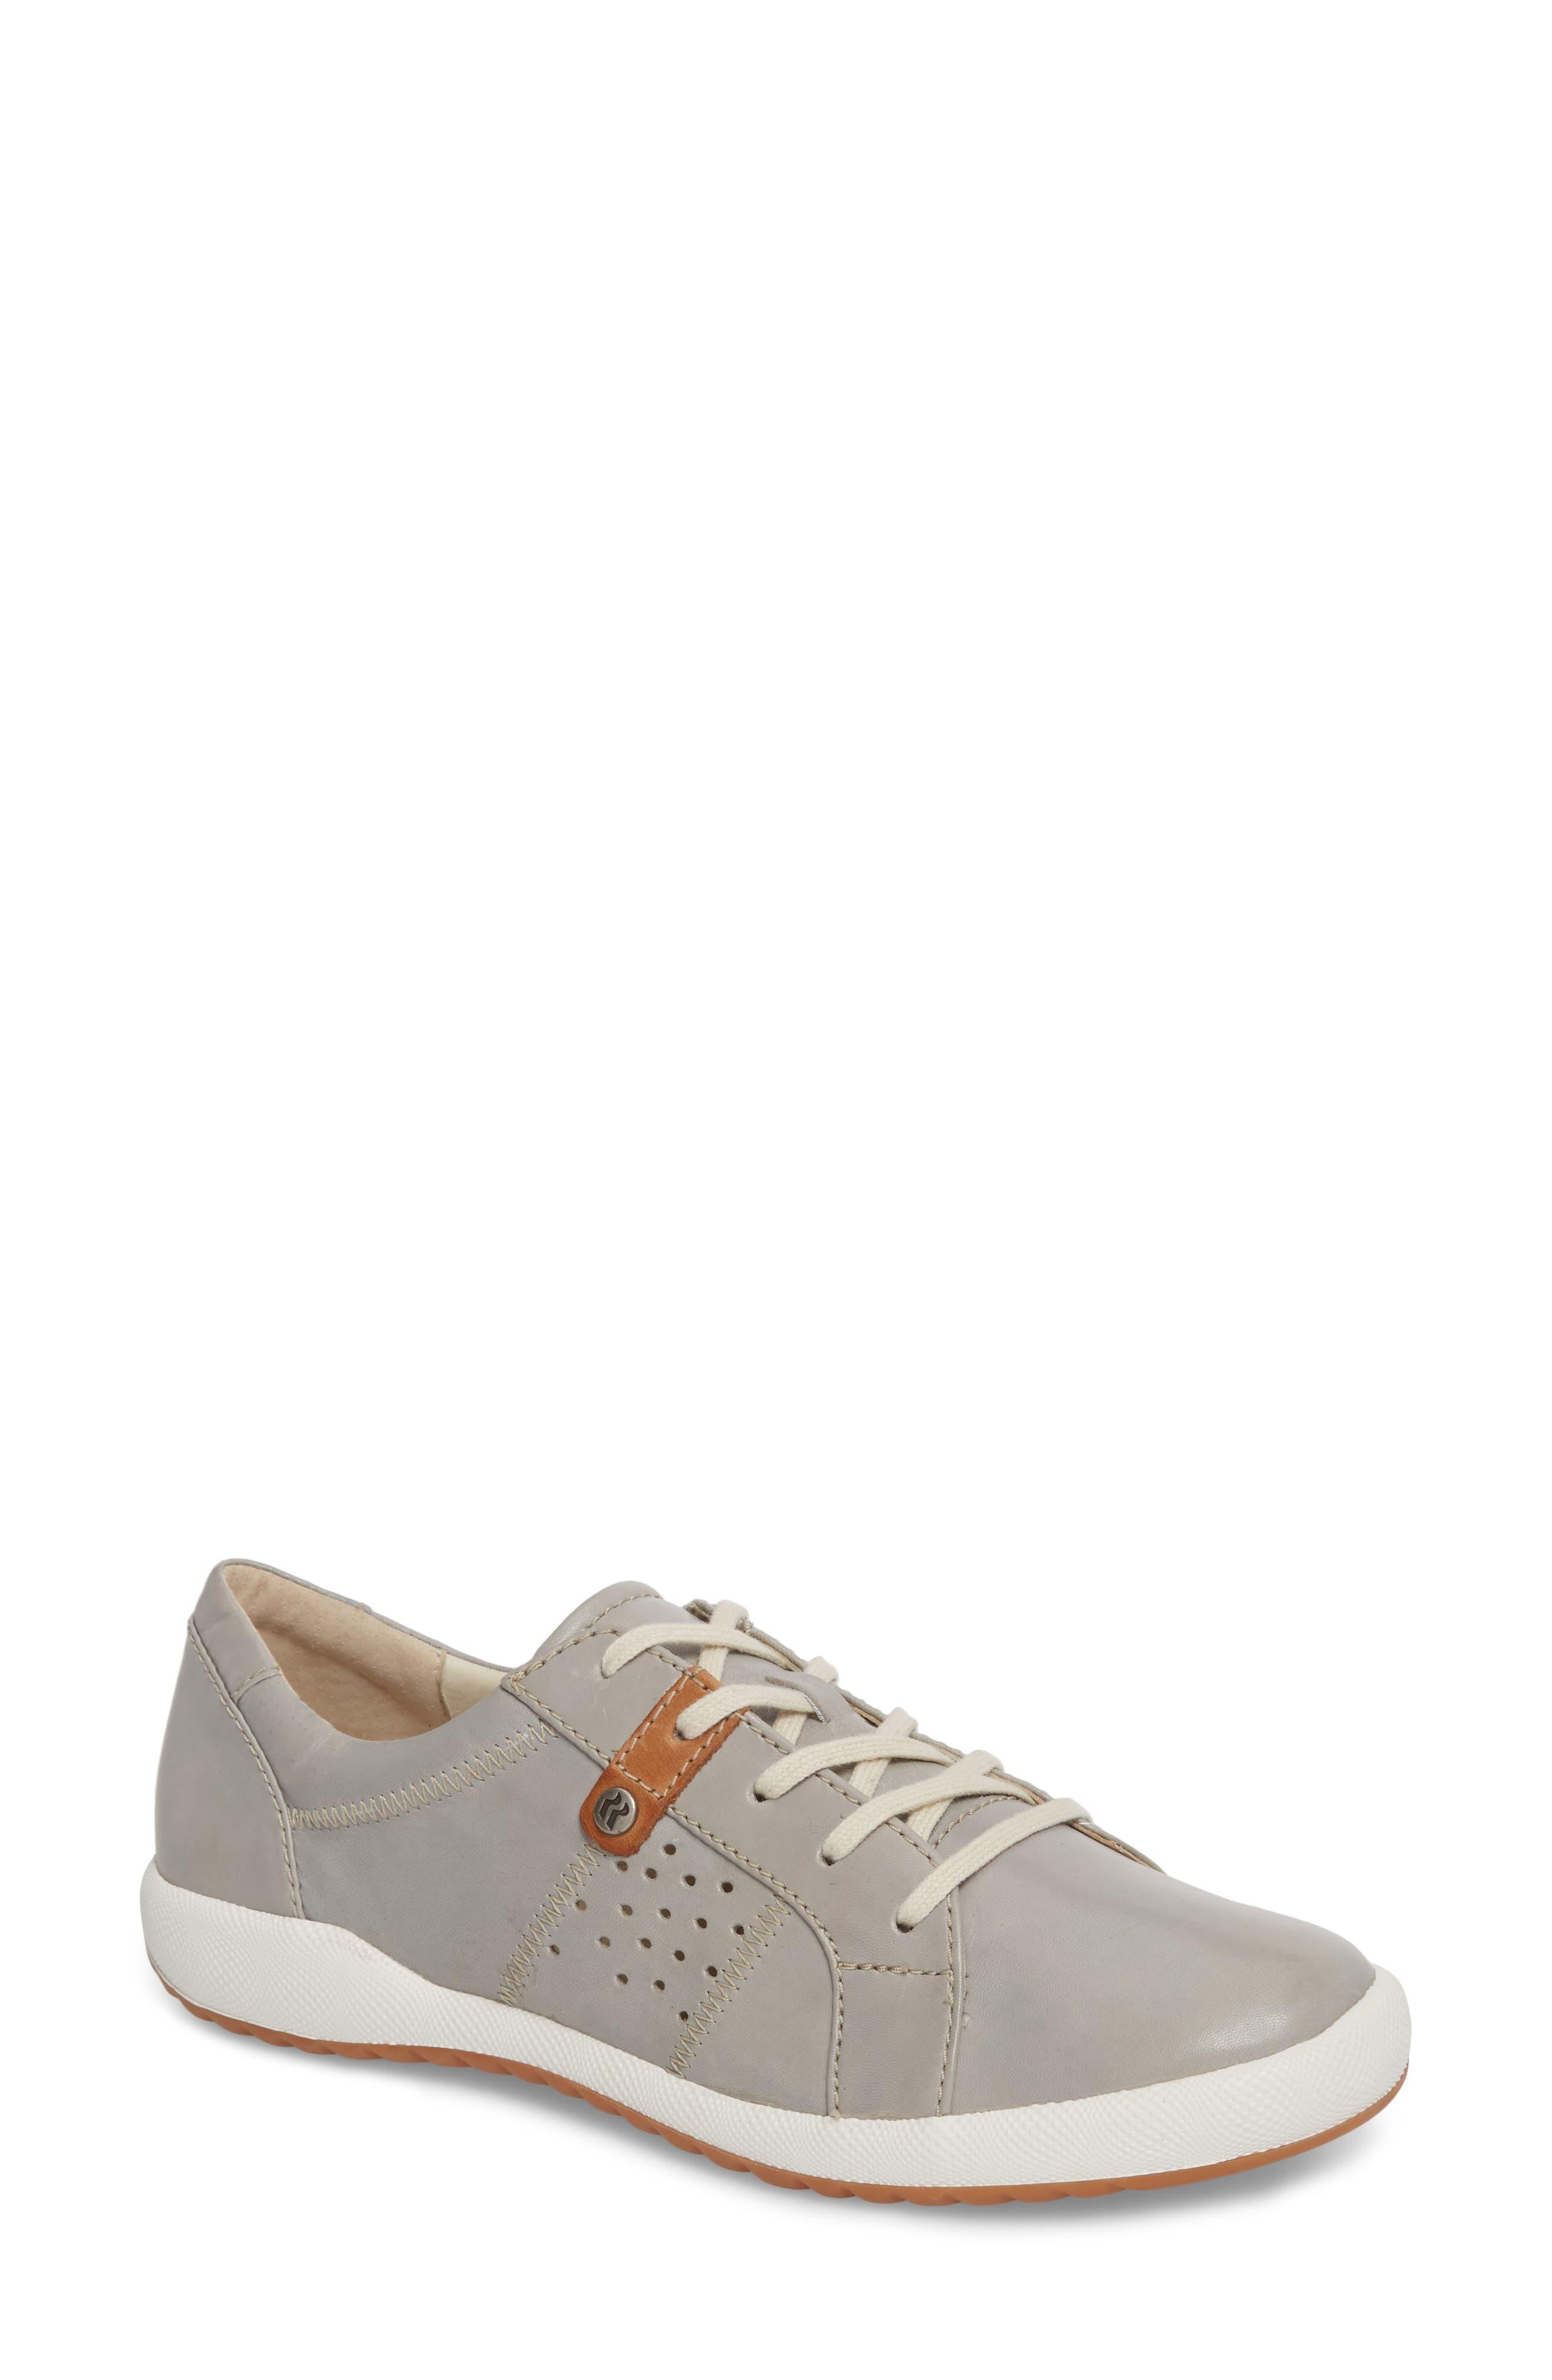 Cordoba 01 Sneaker,                         Main,                         color, GREY LEATHER